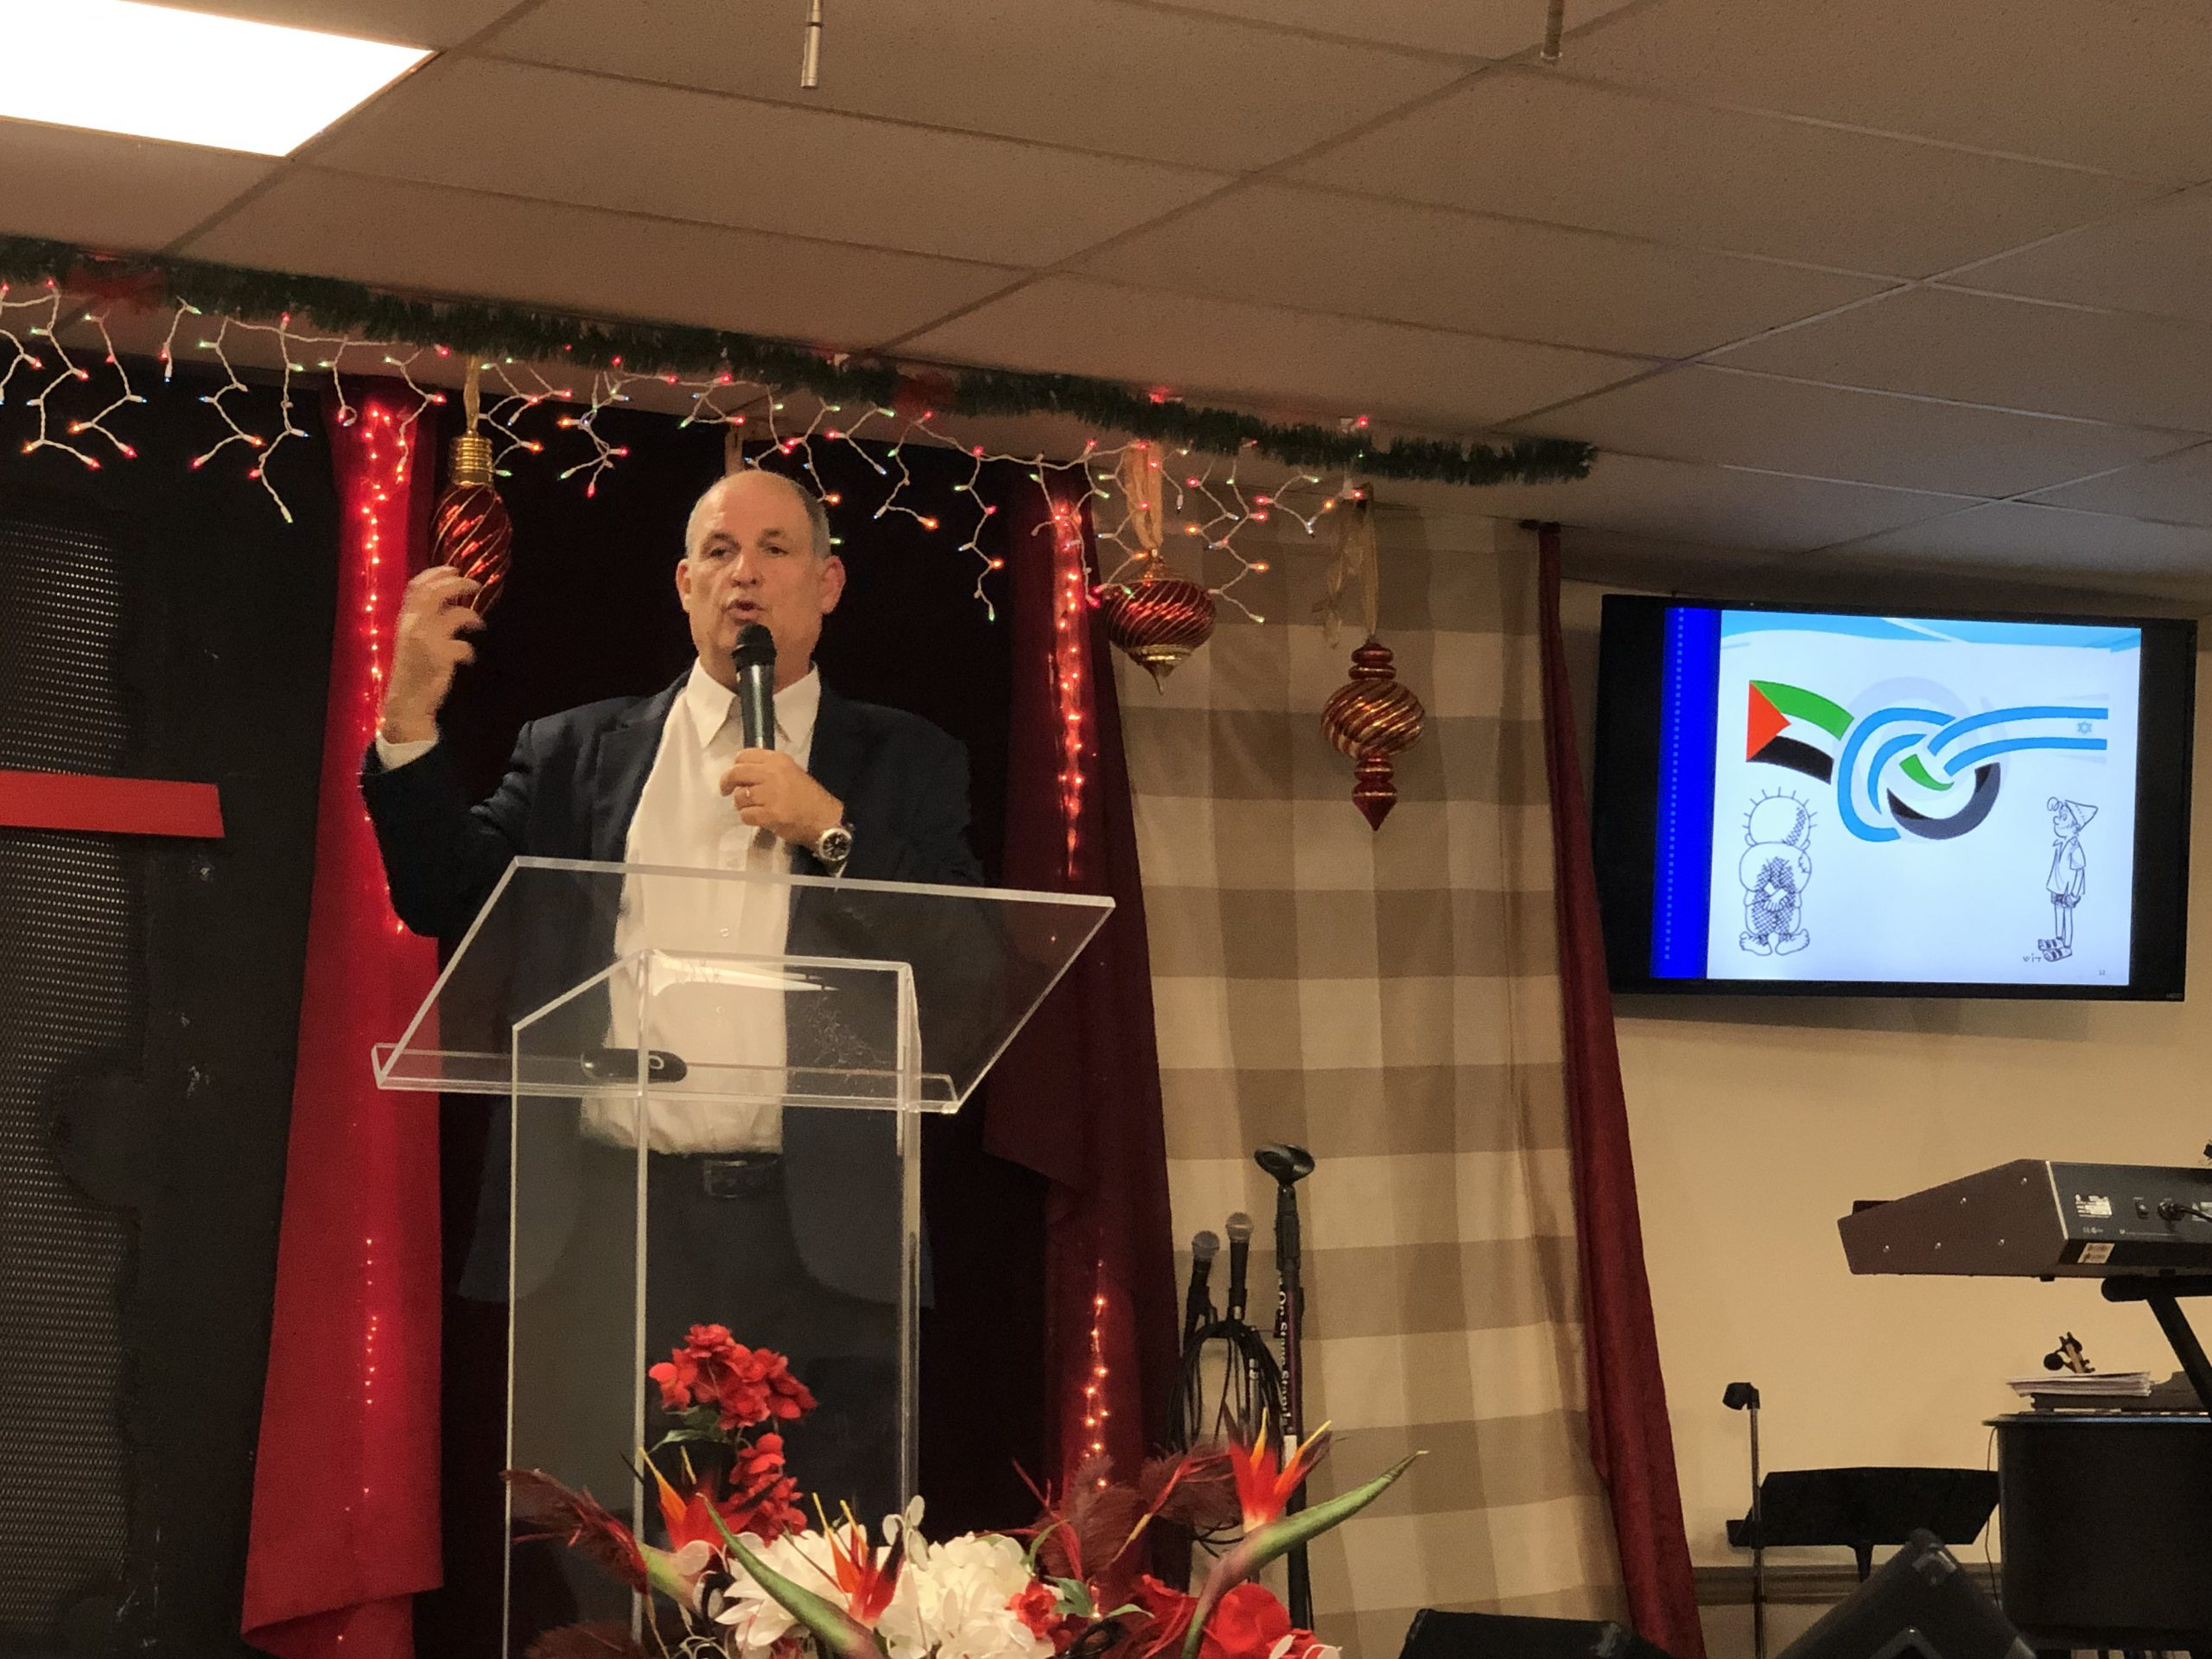 Dec 16th Spokane, WA Why Israel Event